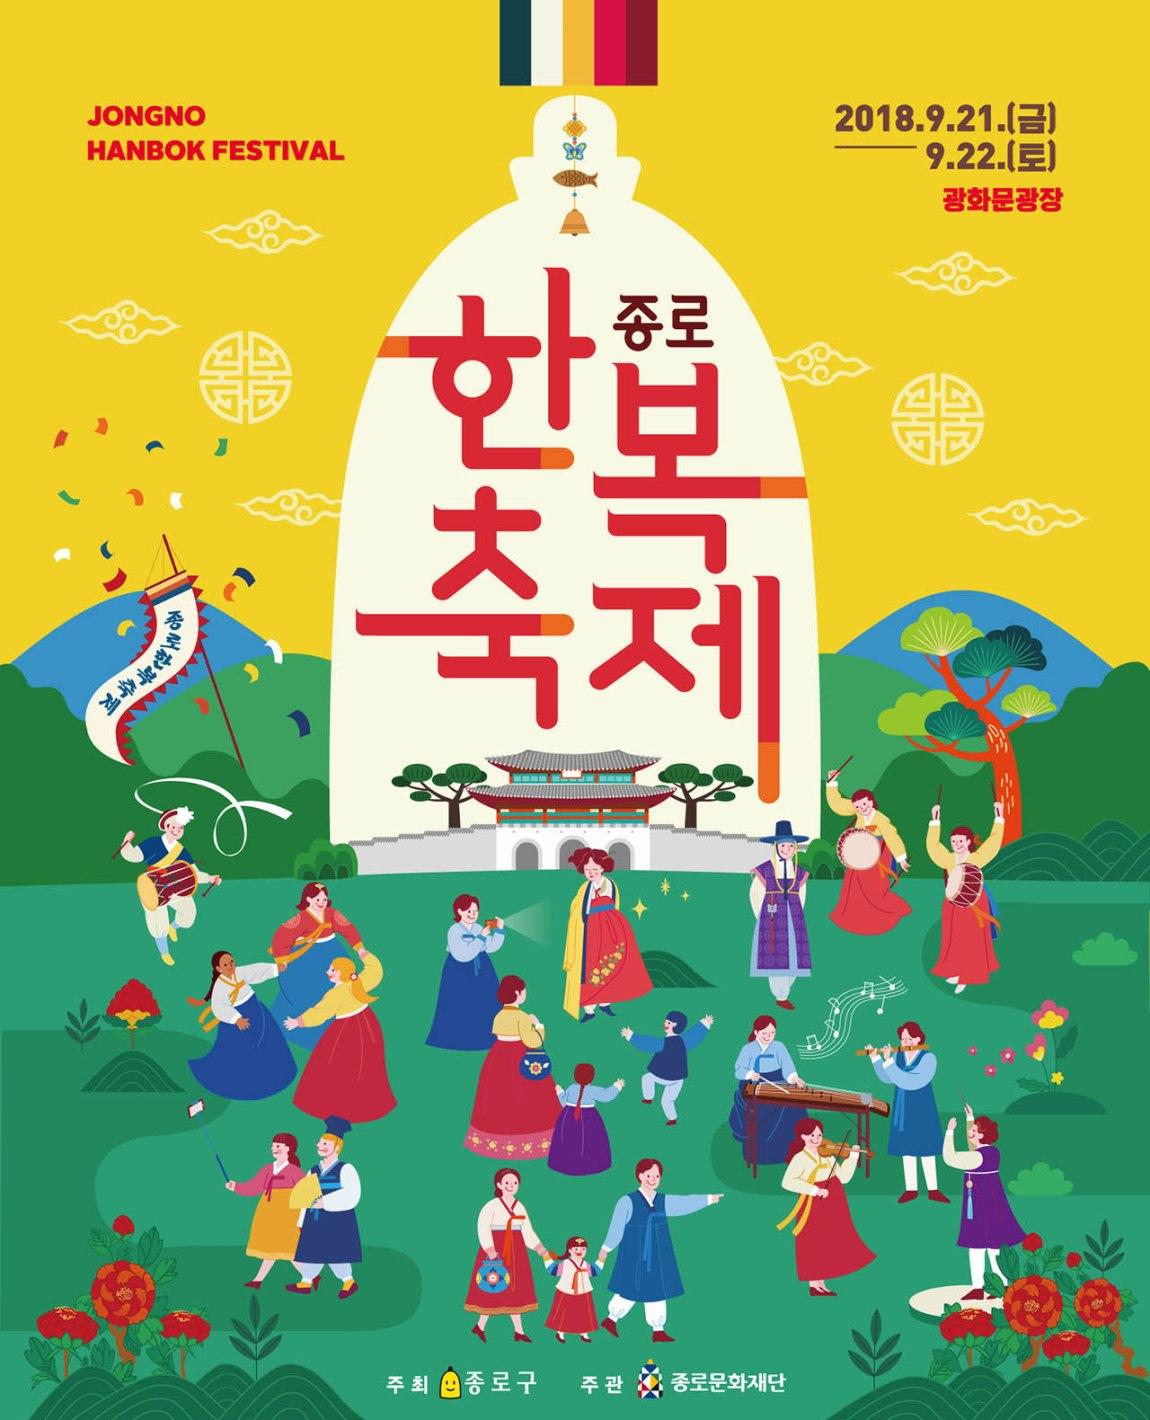 Jongno Hanbok Festival 2018